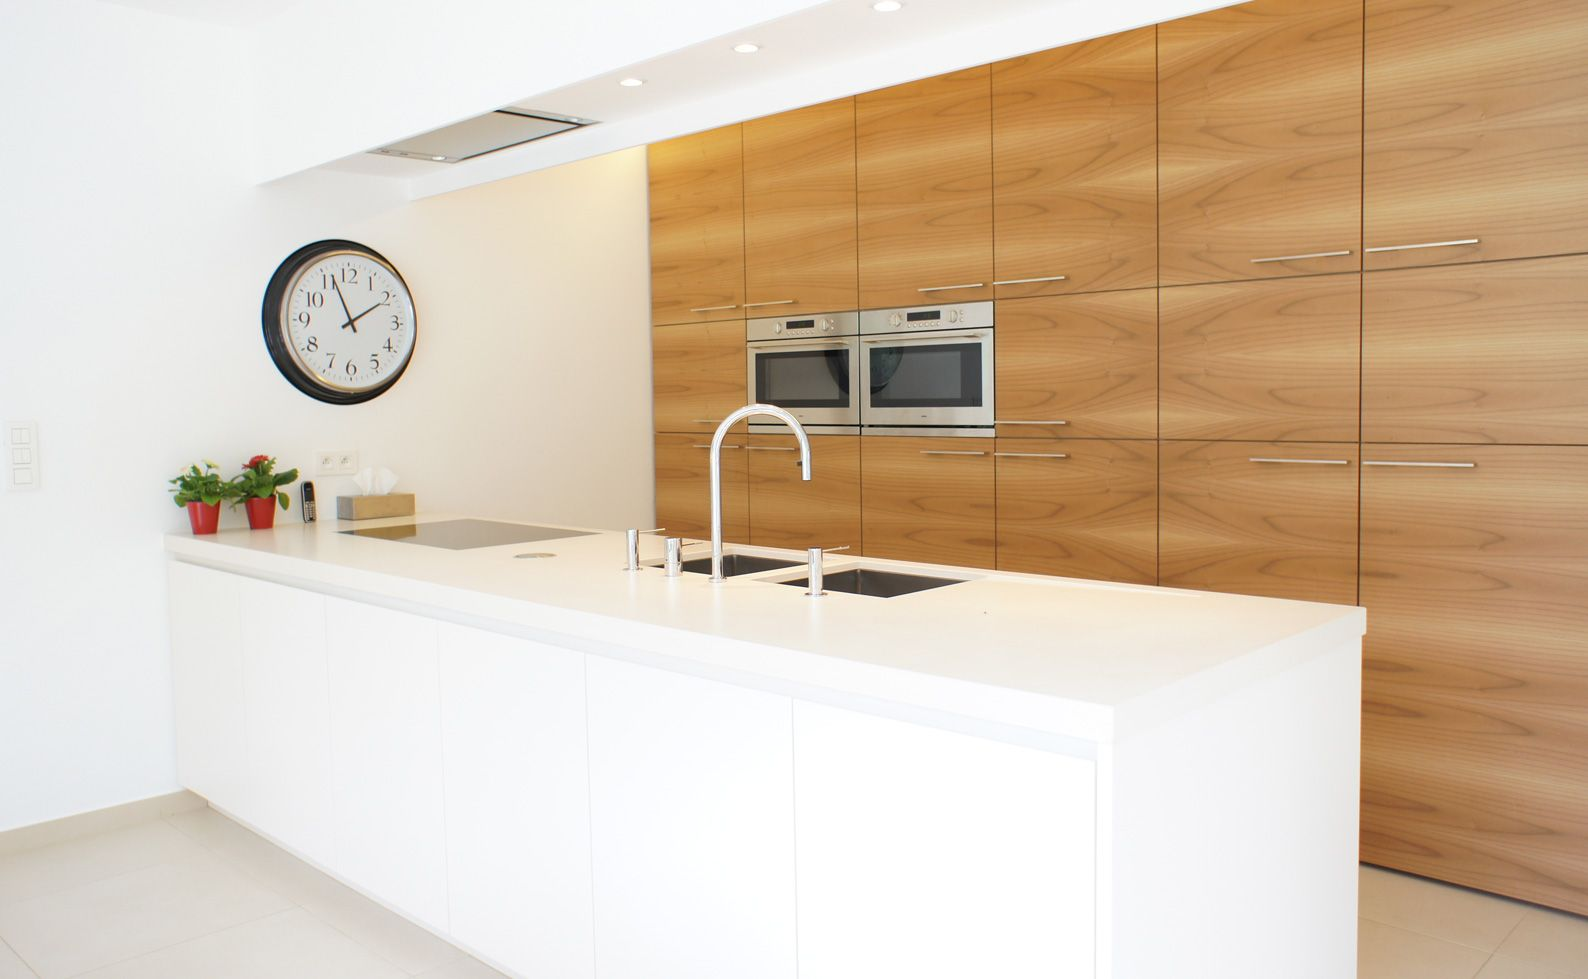 SEGERS INTERIEUR - INTERIEURBOUWERS (Retie - Antwerpen): keukens ...